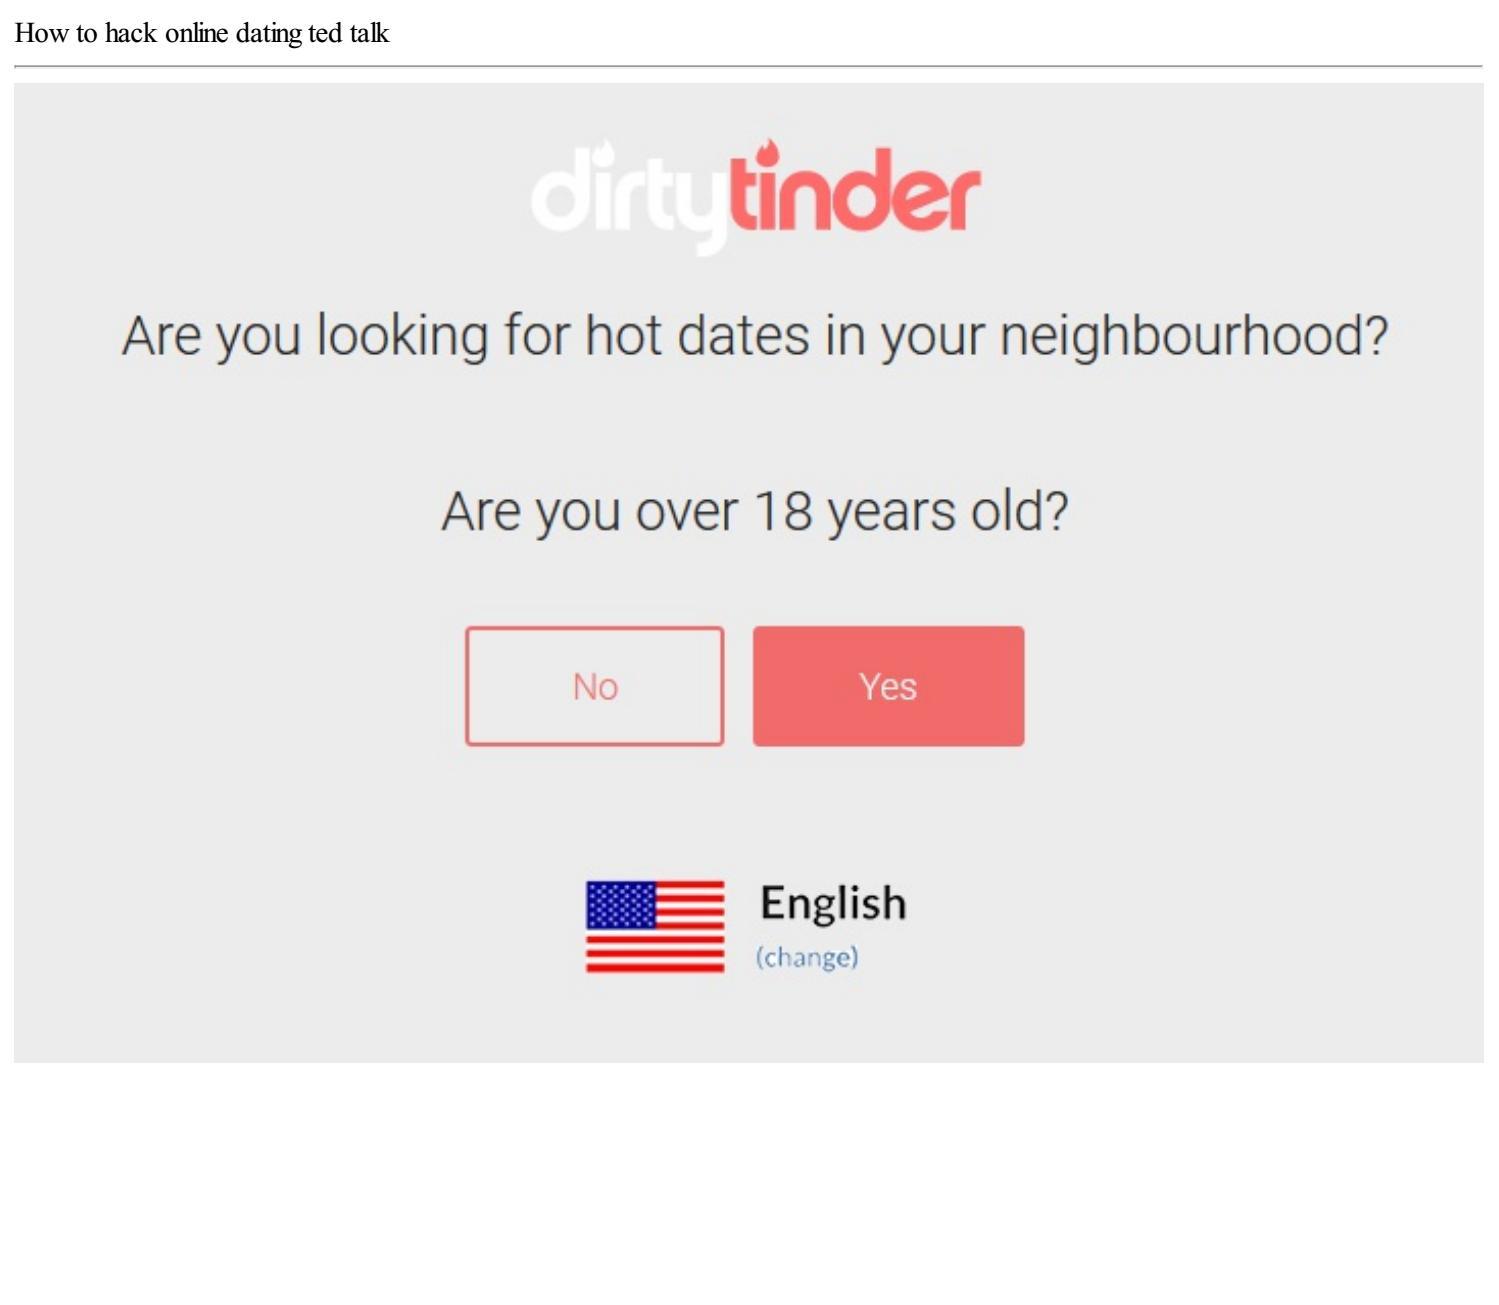 datering efter tredje datum